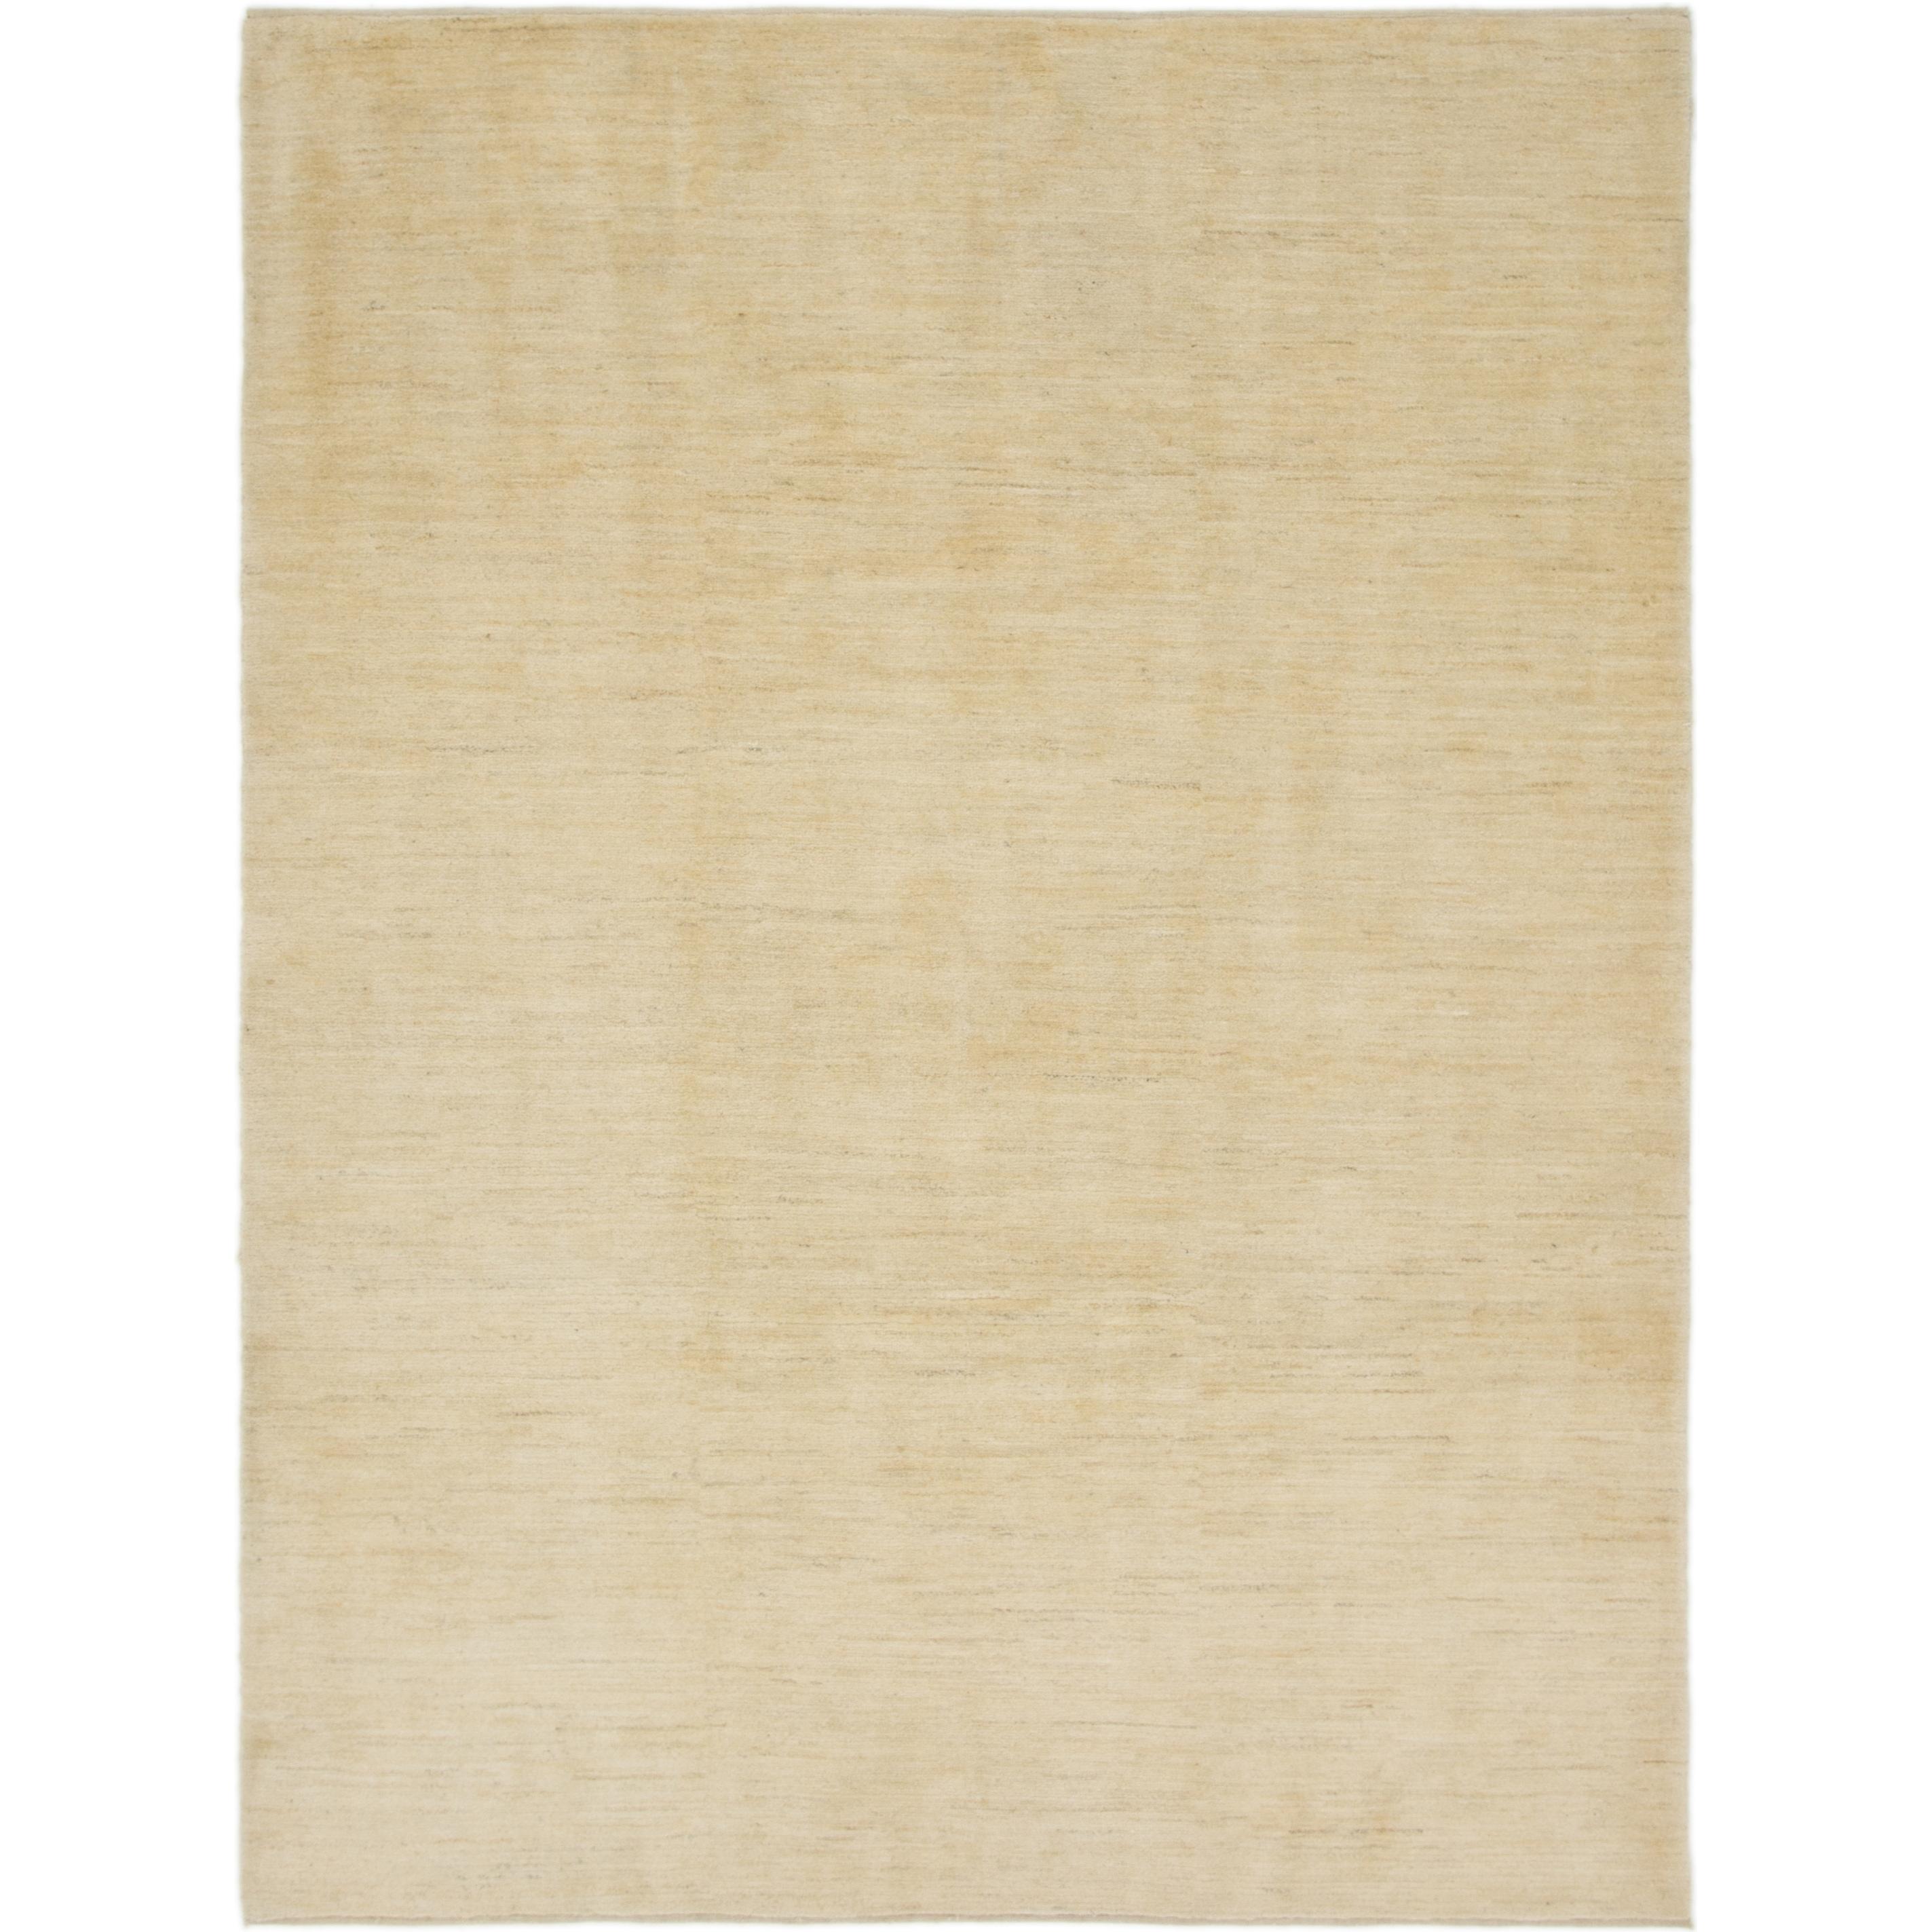 Hand Knotted Kashkuli Gabbeh Wool Area Rug - 7 4 x 9 10 (Cream - 7 4 x 9 10)